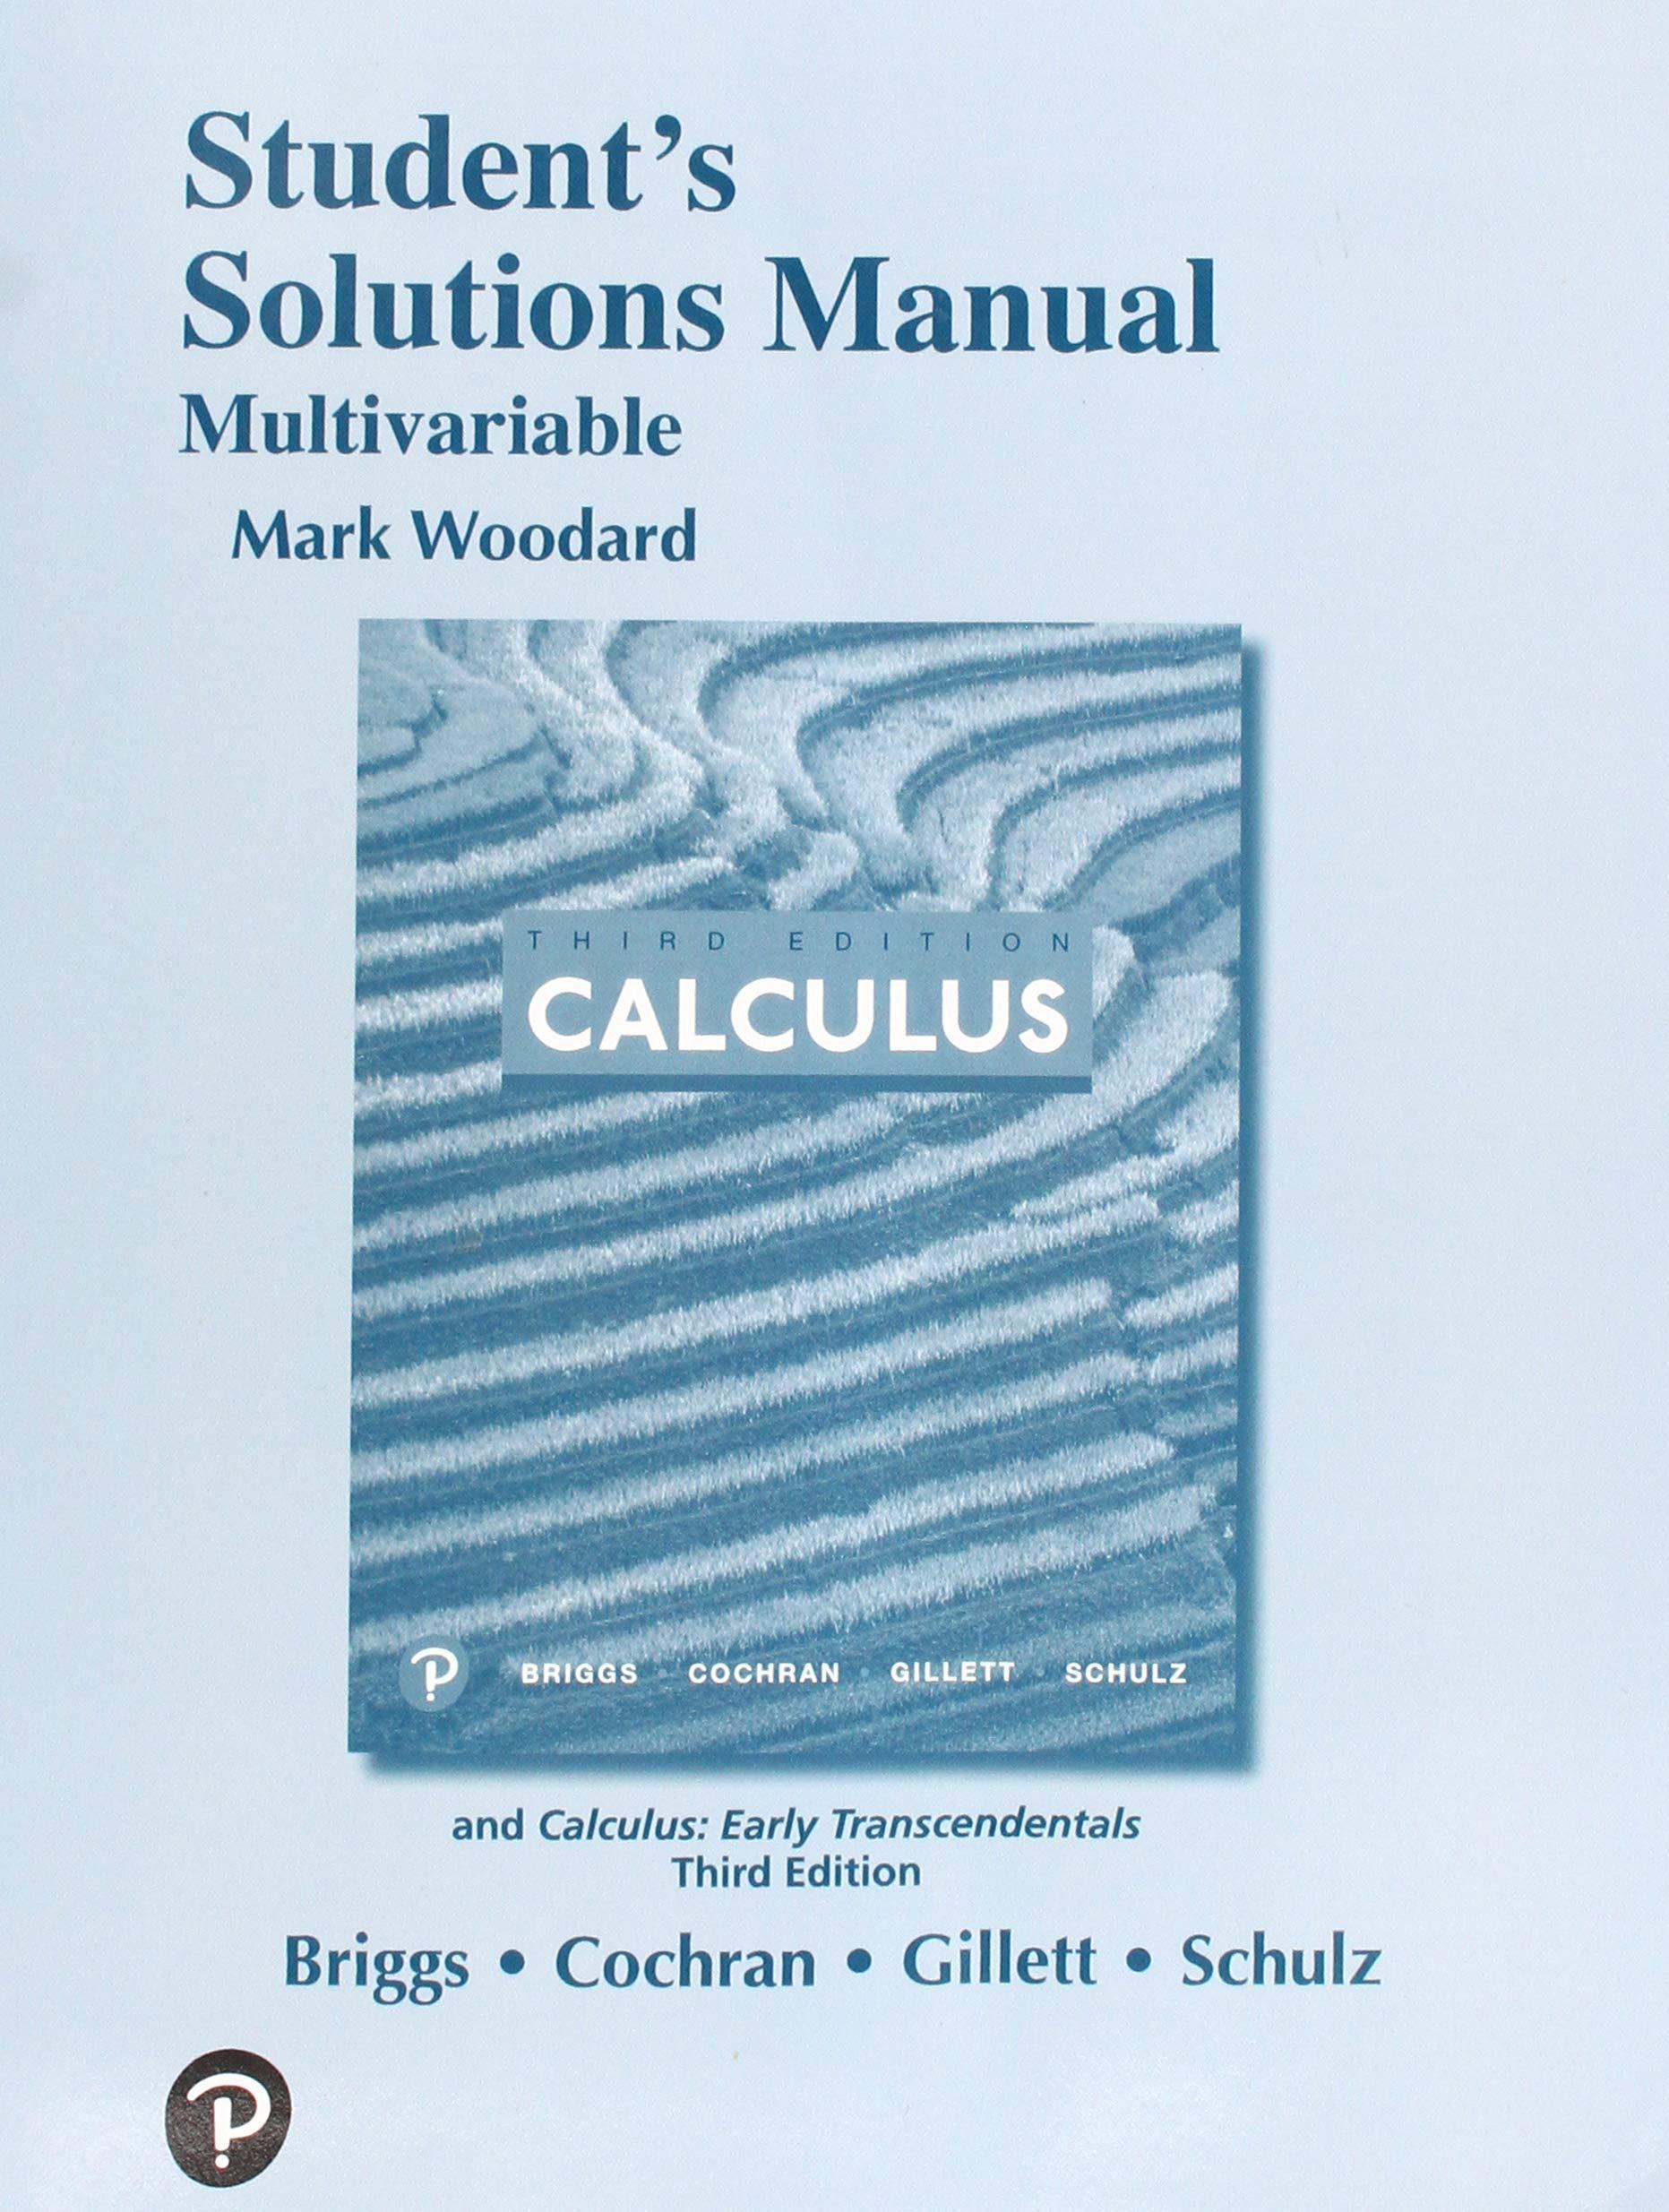 Student's Solutions Manual for Multivariable Calculus: William L. Briggs,  Lyle Cochran, Bernard Gillett, Eric Schulz: 9780134766829: Mathematics:  Amazon ...